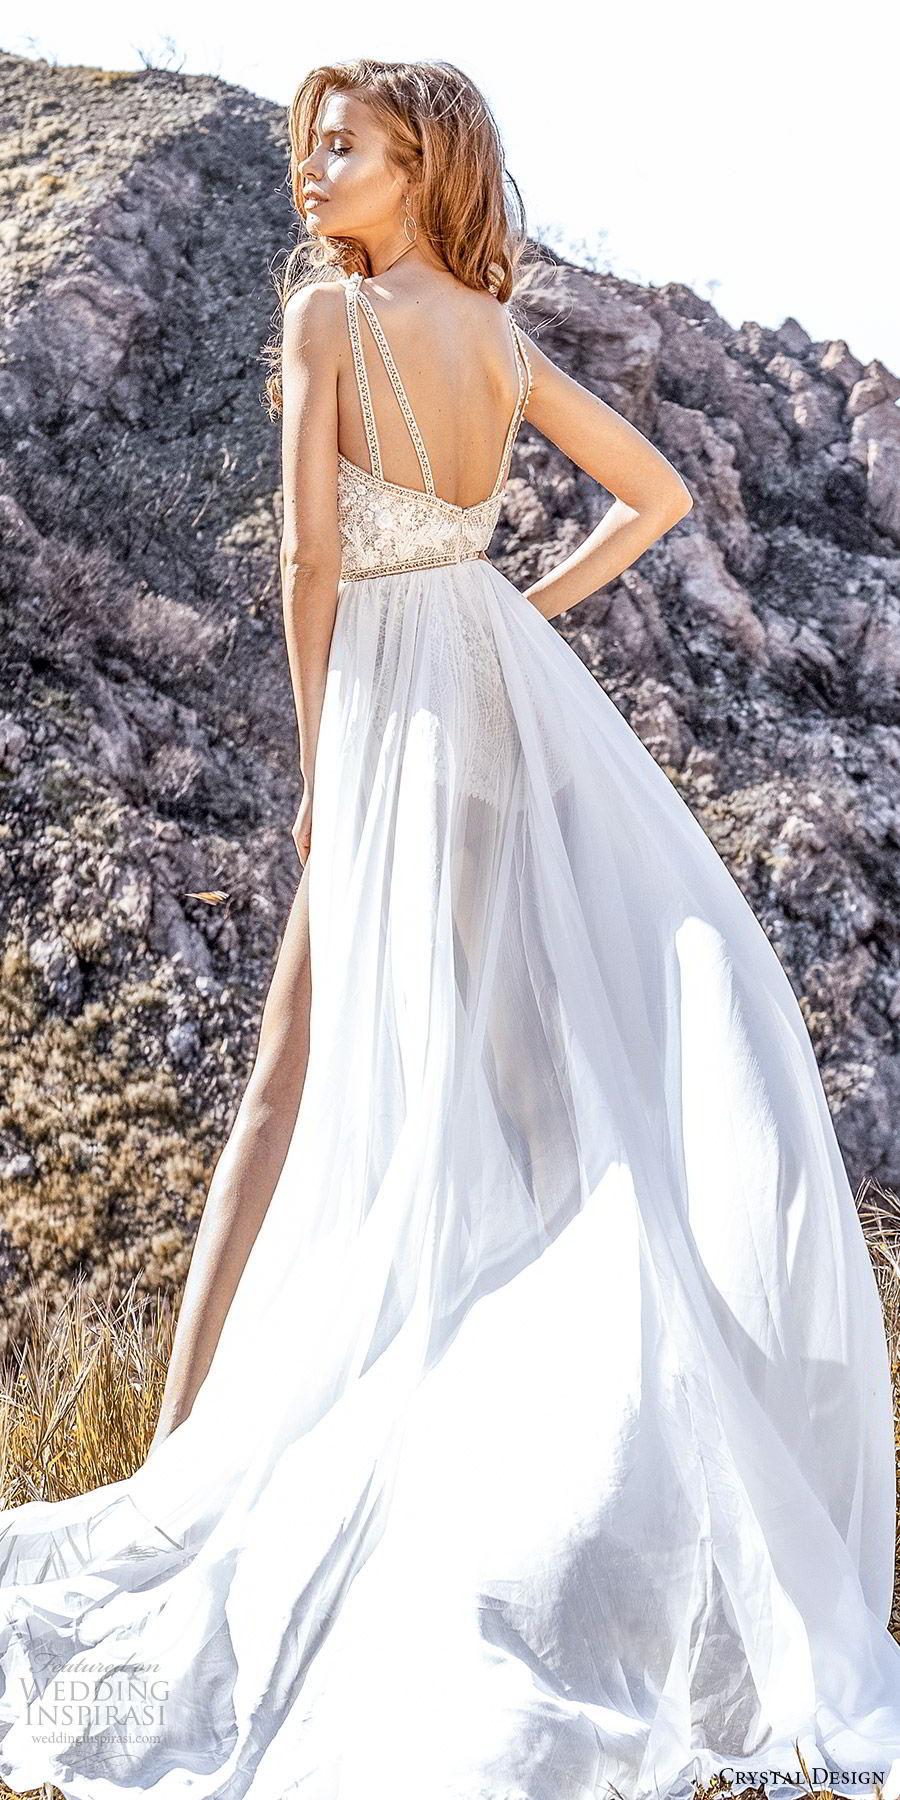 crystal design 2020 couture bridal sleeveless beaded straps plunging split sweetheart neckline bodysuit aline wedding dress slit sheer skirt (2) sexy modern chapel train bv